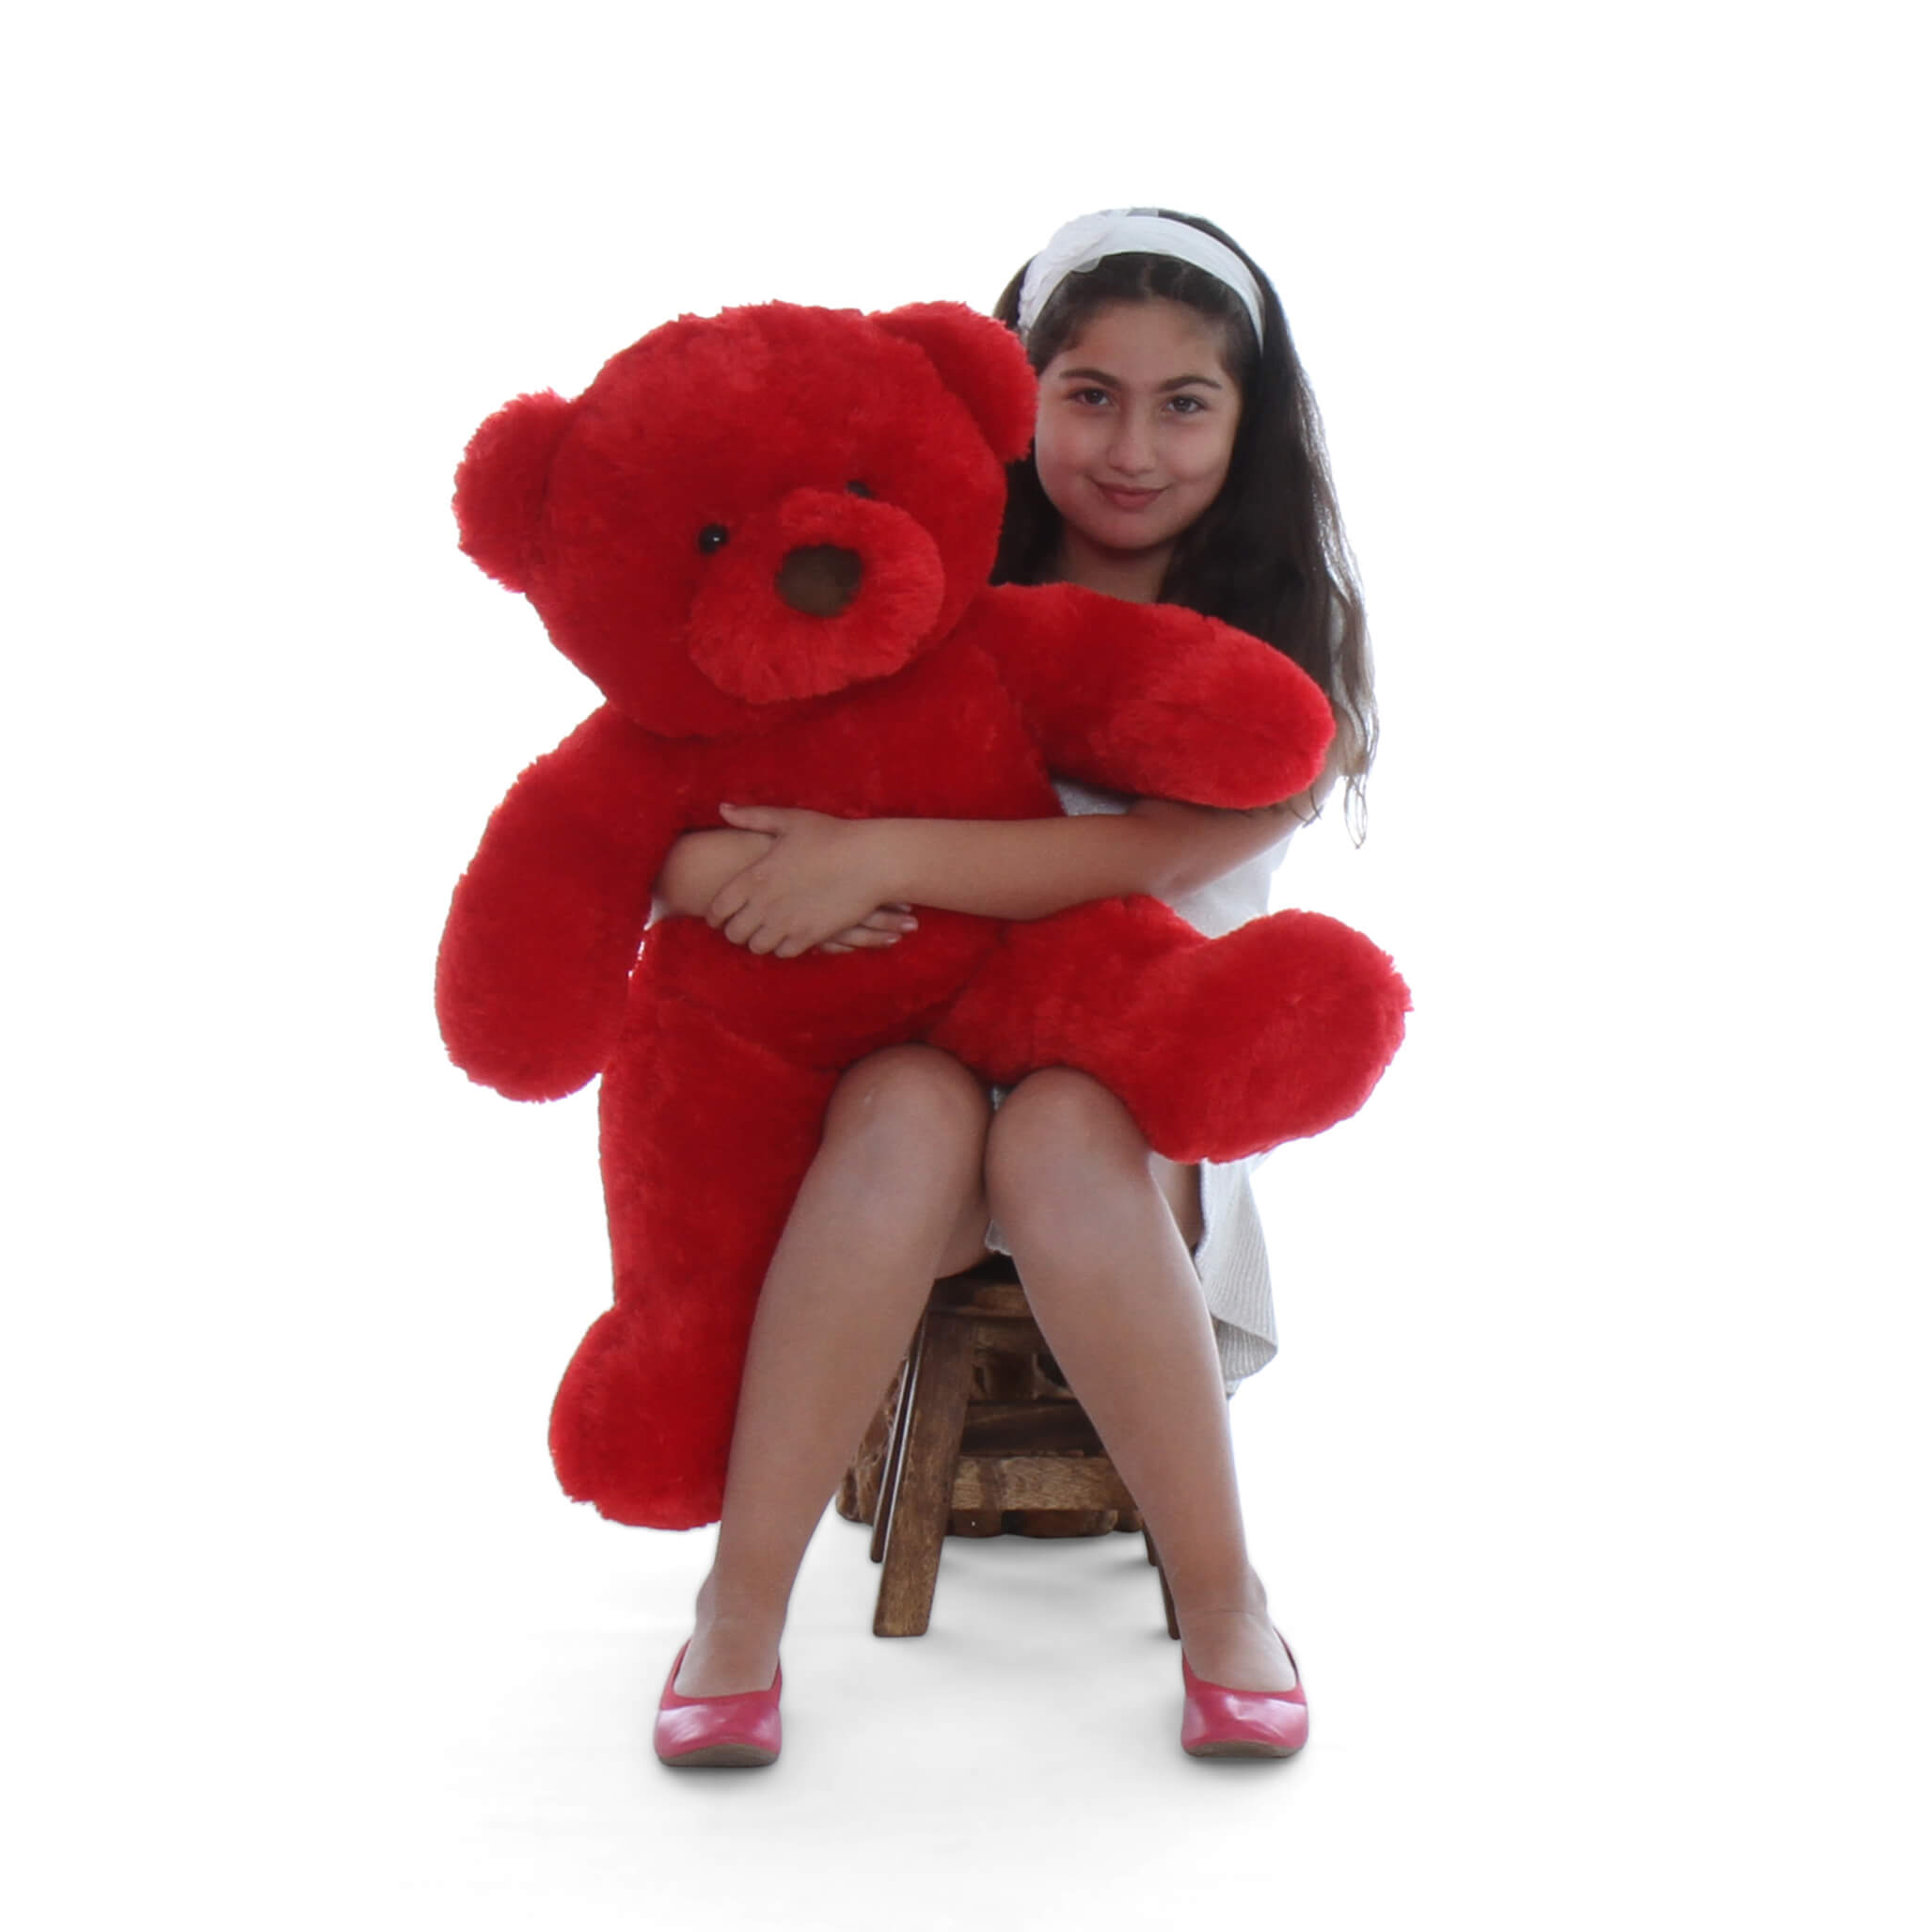 big-red-teddy-bear-huggable-riley-chubs-30in-1.jpg